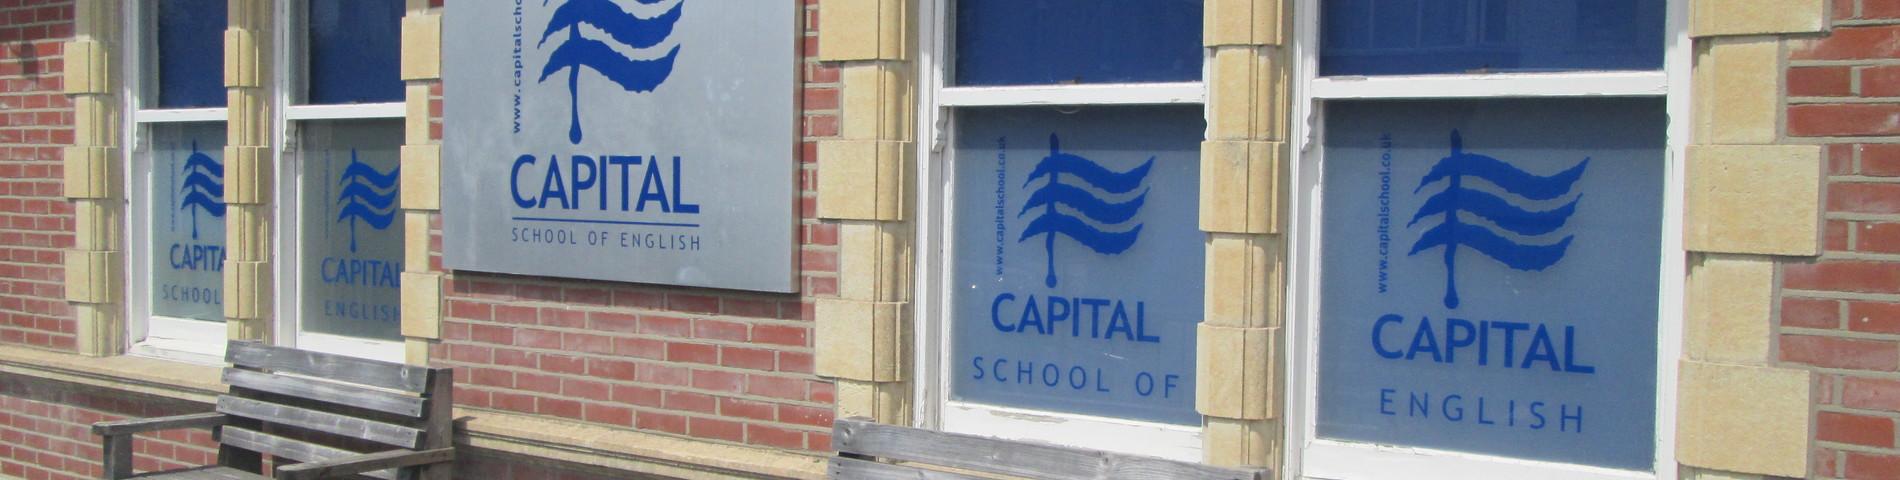 Capital School of English bild 1